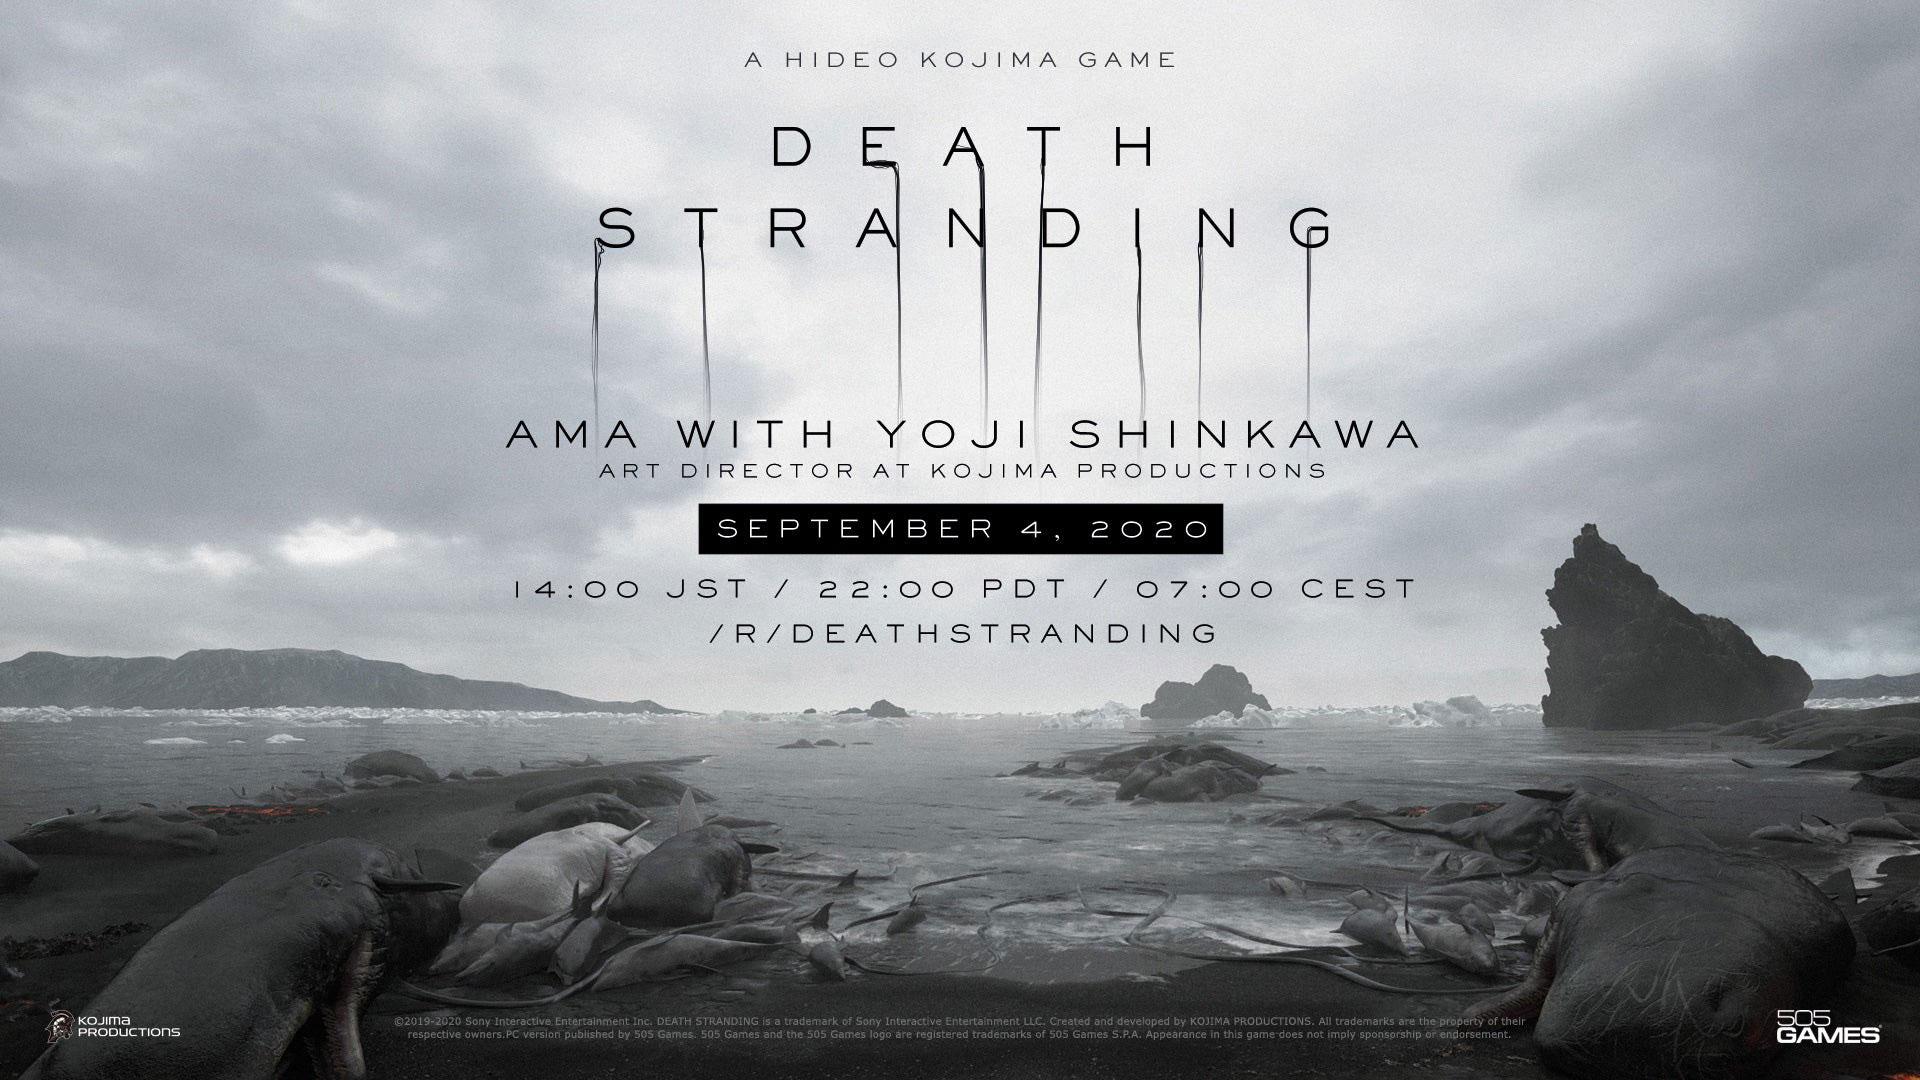 AMA Yoji Shinkawa